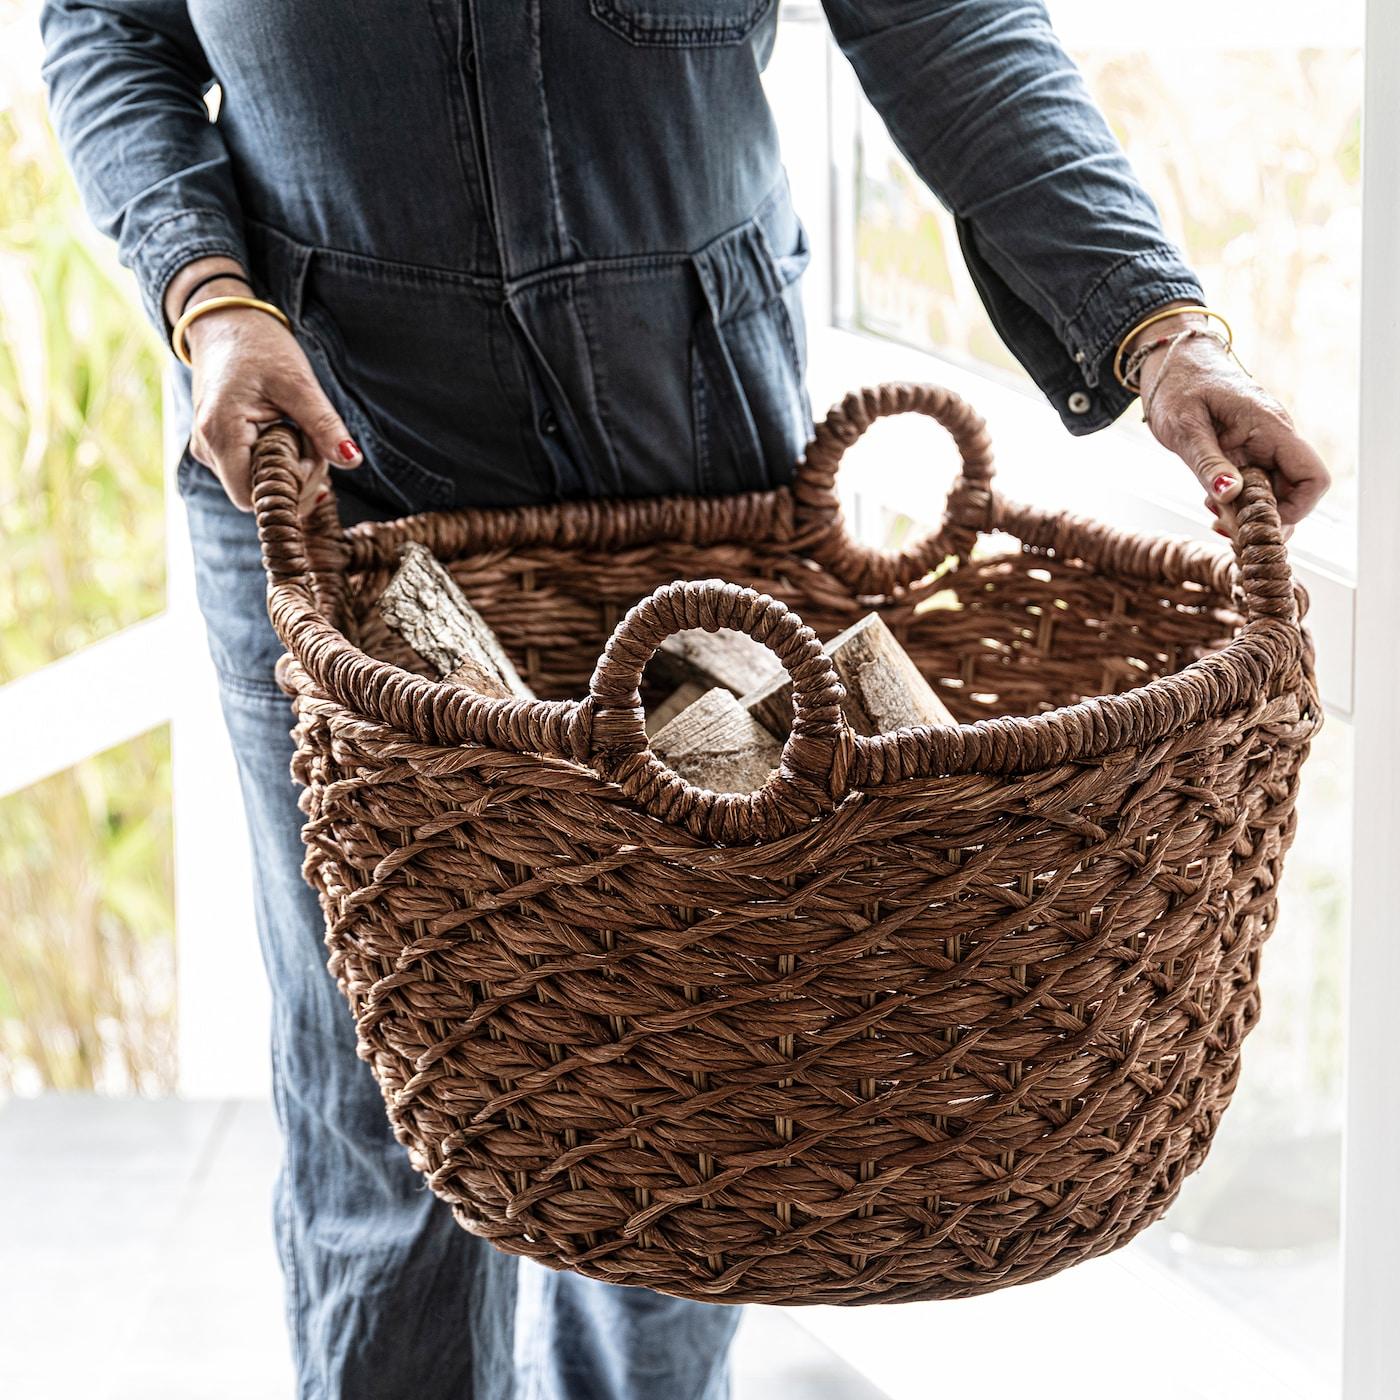 "LUSTIGKURRE Basket, brown/nipa palm, 22 ½x22 ½x15 ¾ """